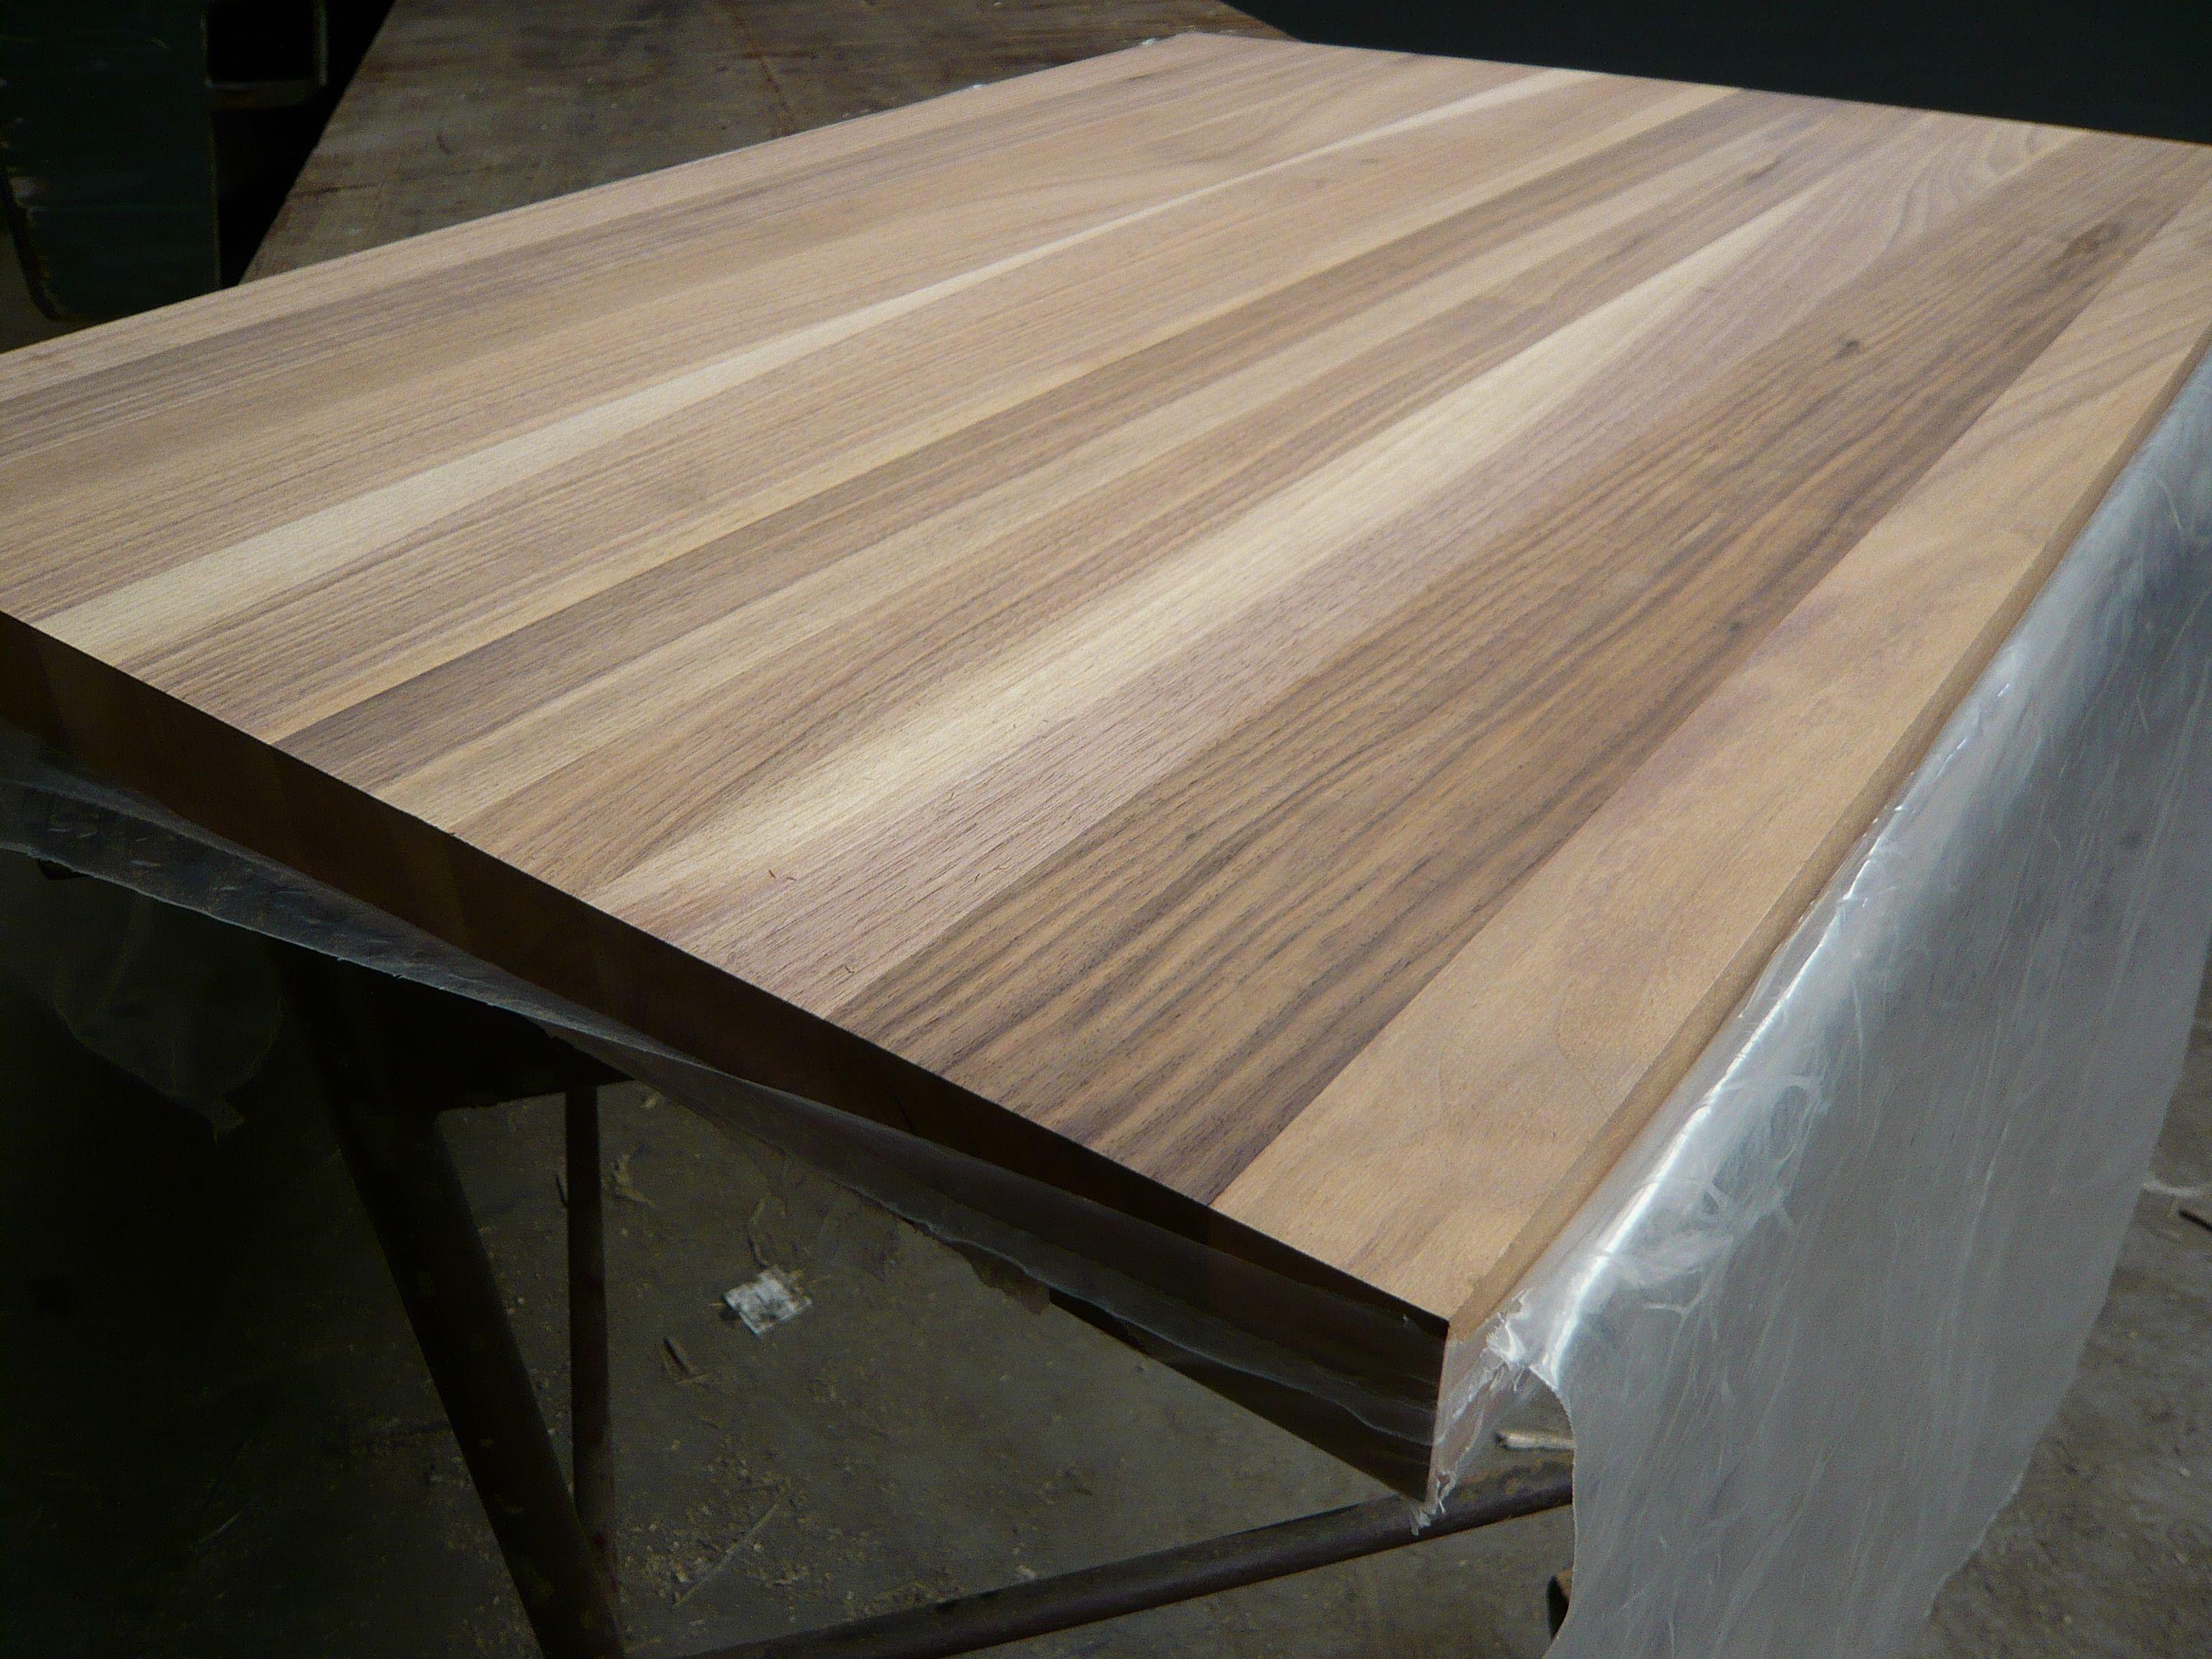 Leimholzplatte Massivholzplatte Nussbaum Durchgehende Lamelle D3 Verleimt Geschliffen 80er Korn Holz Nussbaum Holzplatte